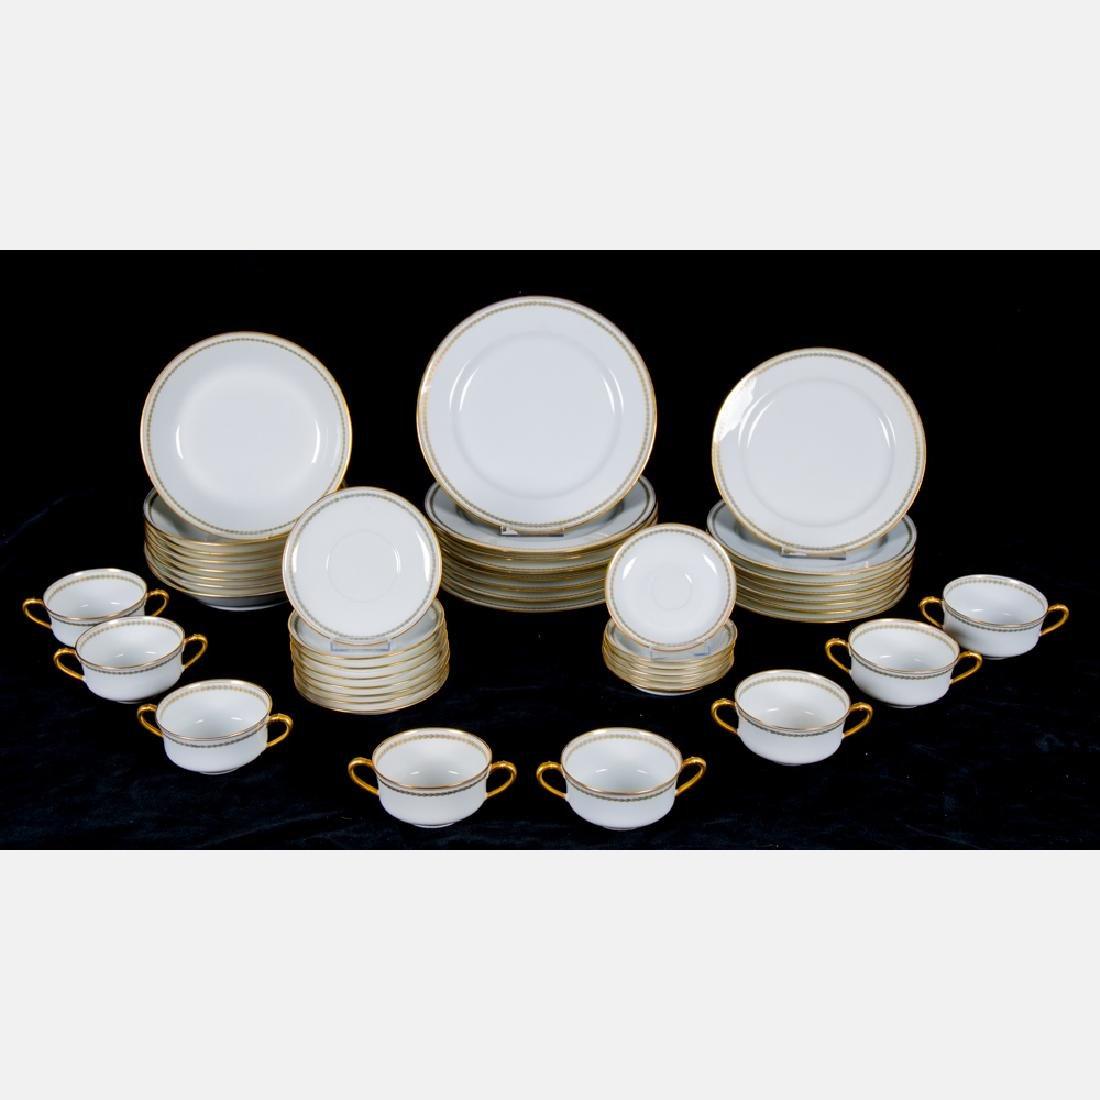 A Haviland Limoges Partial Porcelain Dinner Service,